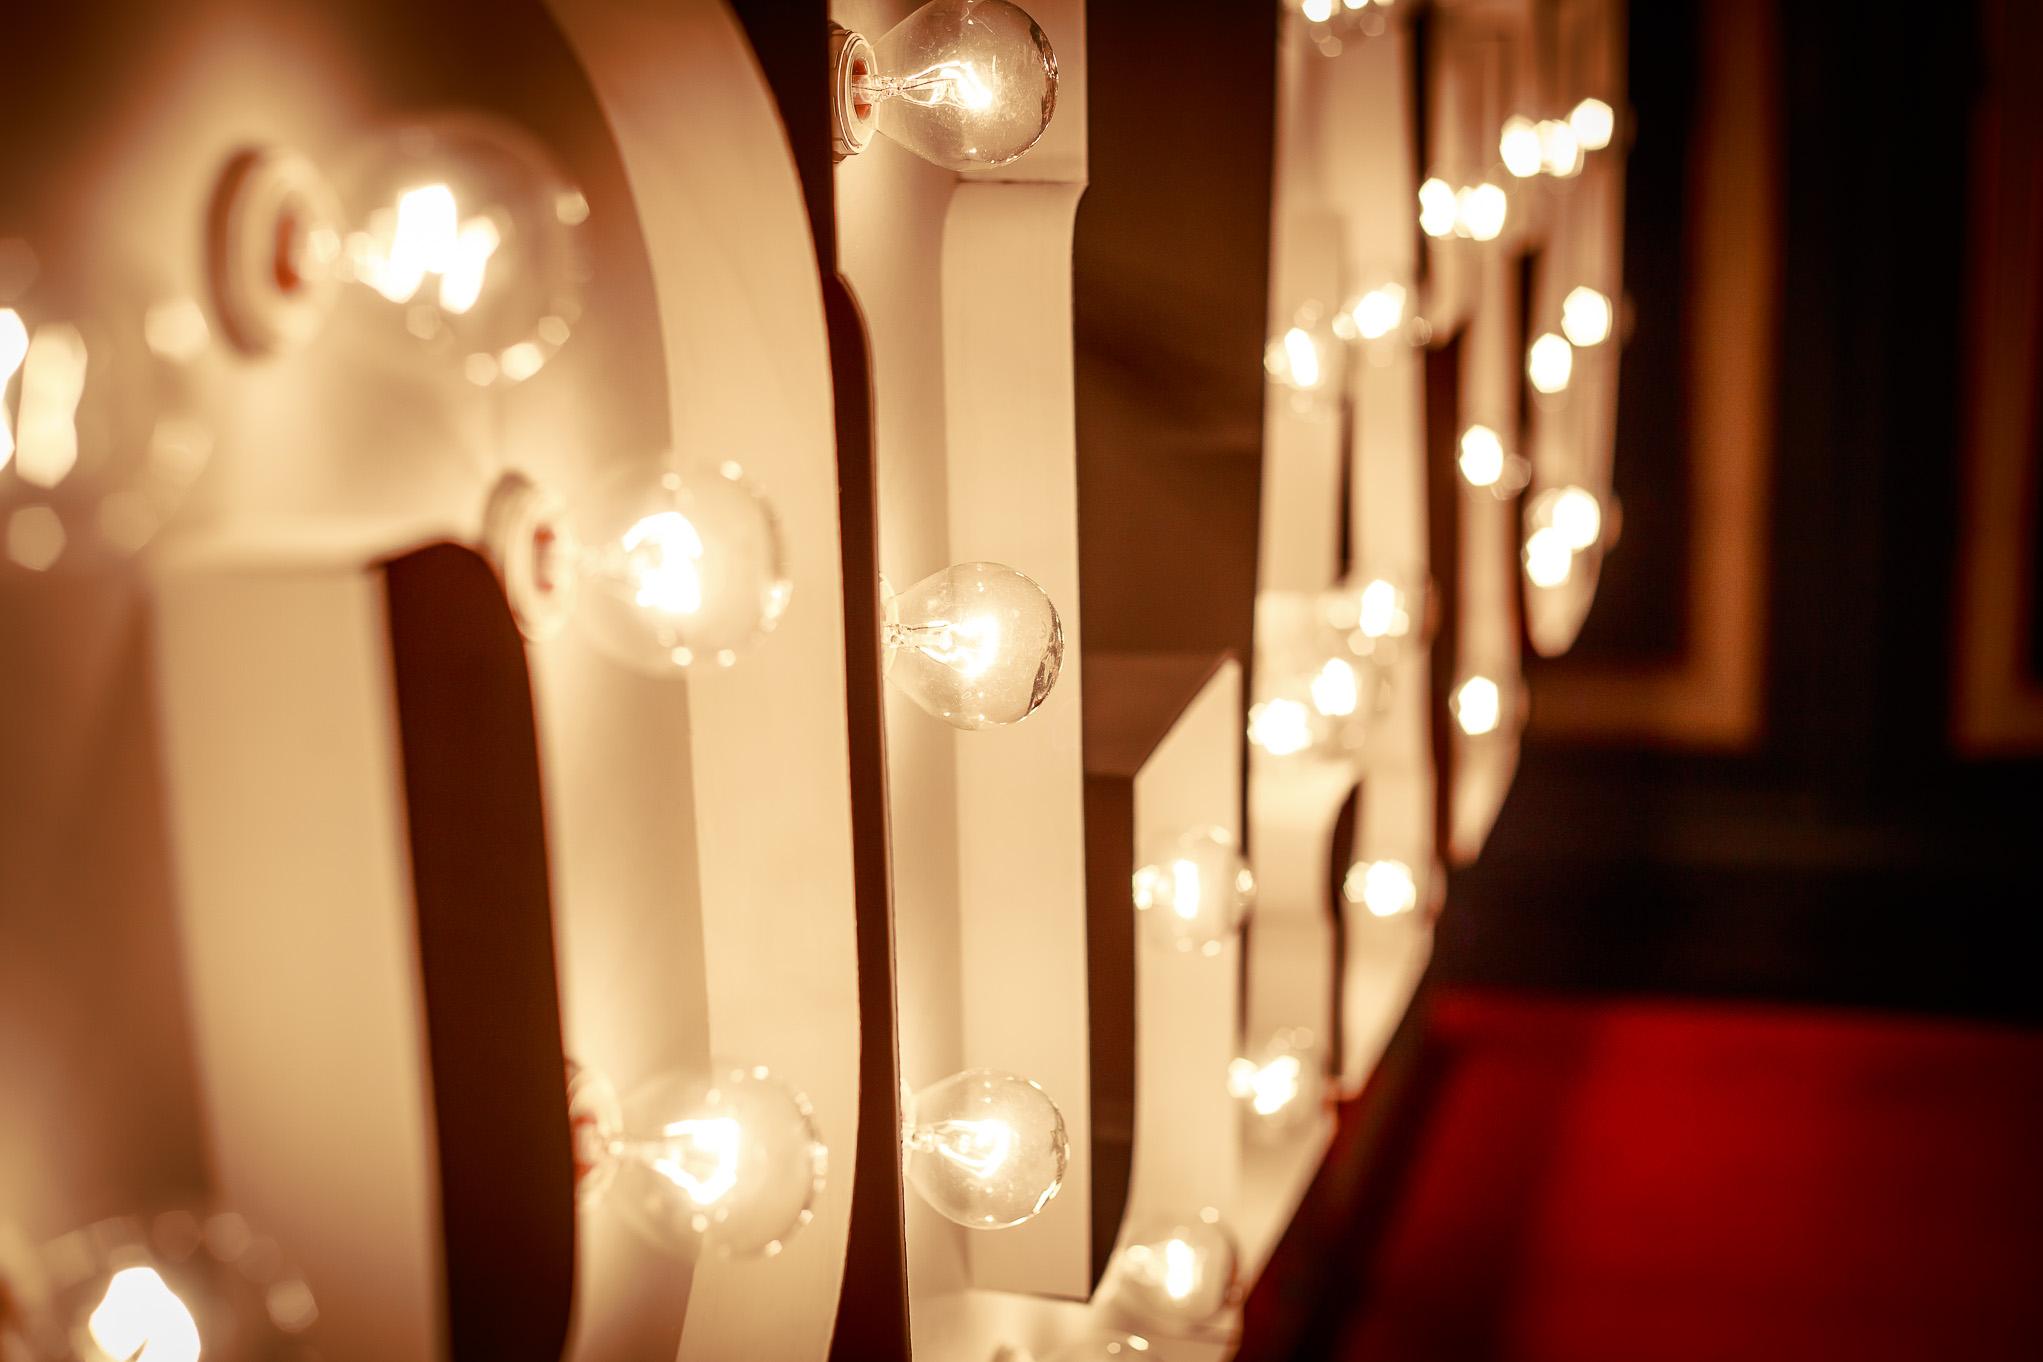 detalle-letras-luminosas-ilallum